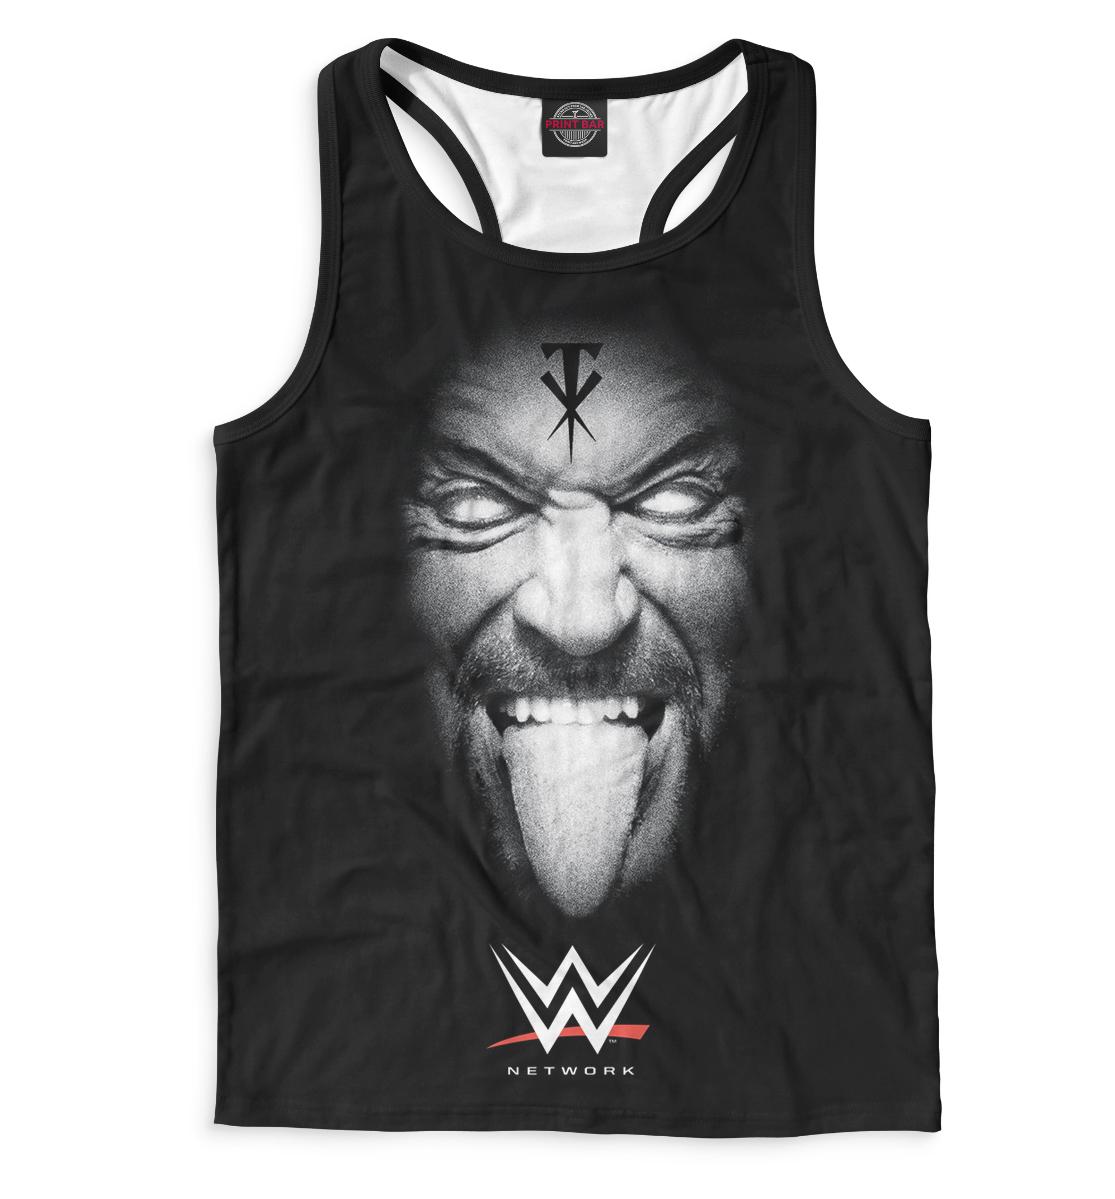 Купить Мужская майка-борцовка Гробовщик WWE-648807-mayb-2